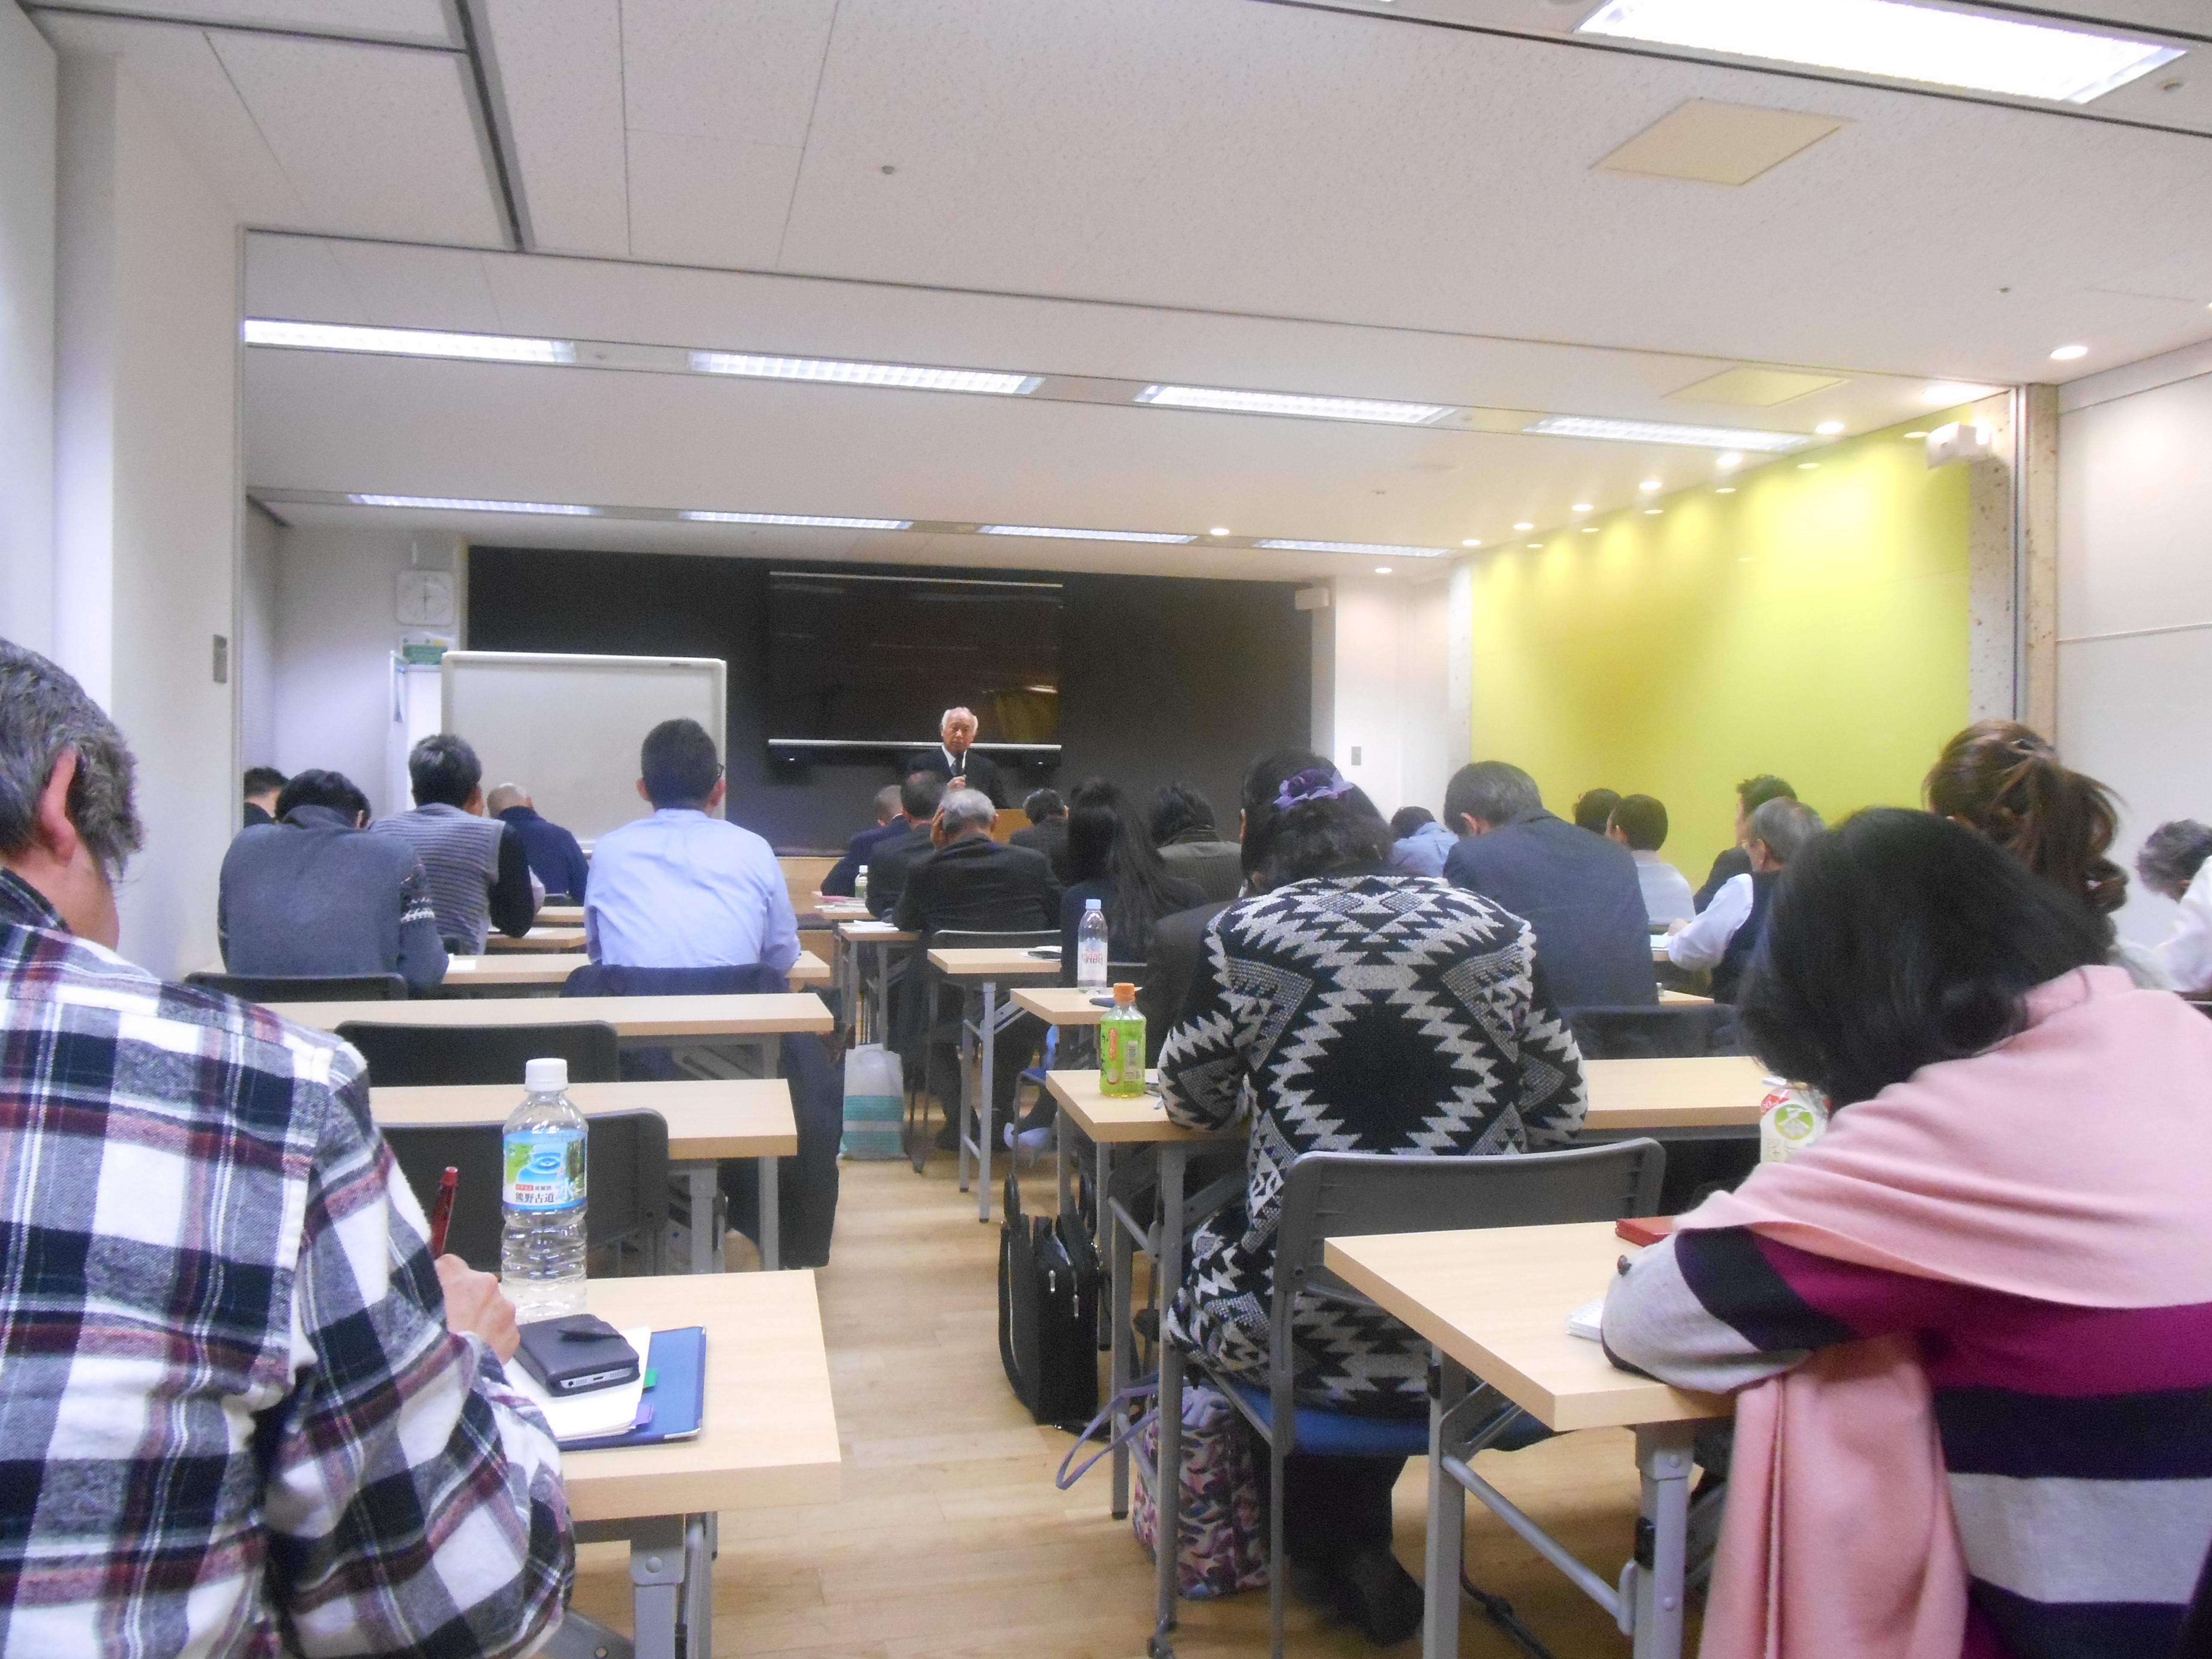 DSCN0056 1 - 平成30年度 東京思風塾 4月7日(土)「時代が問題をつくり、問題が人物をつくる」